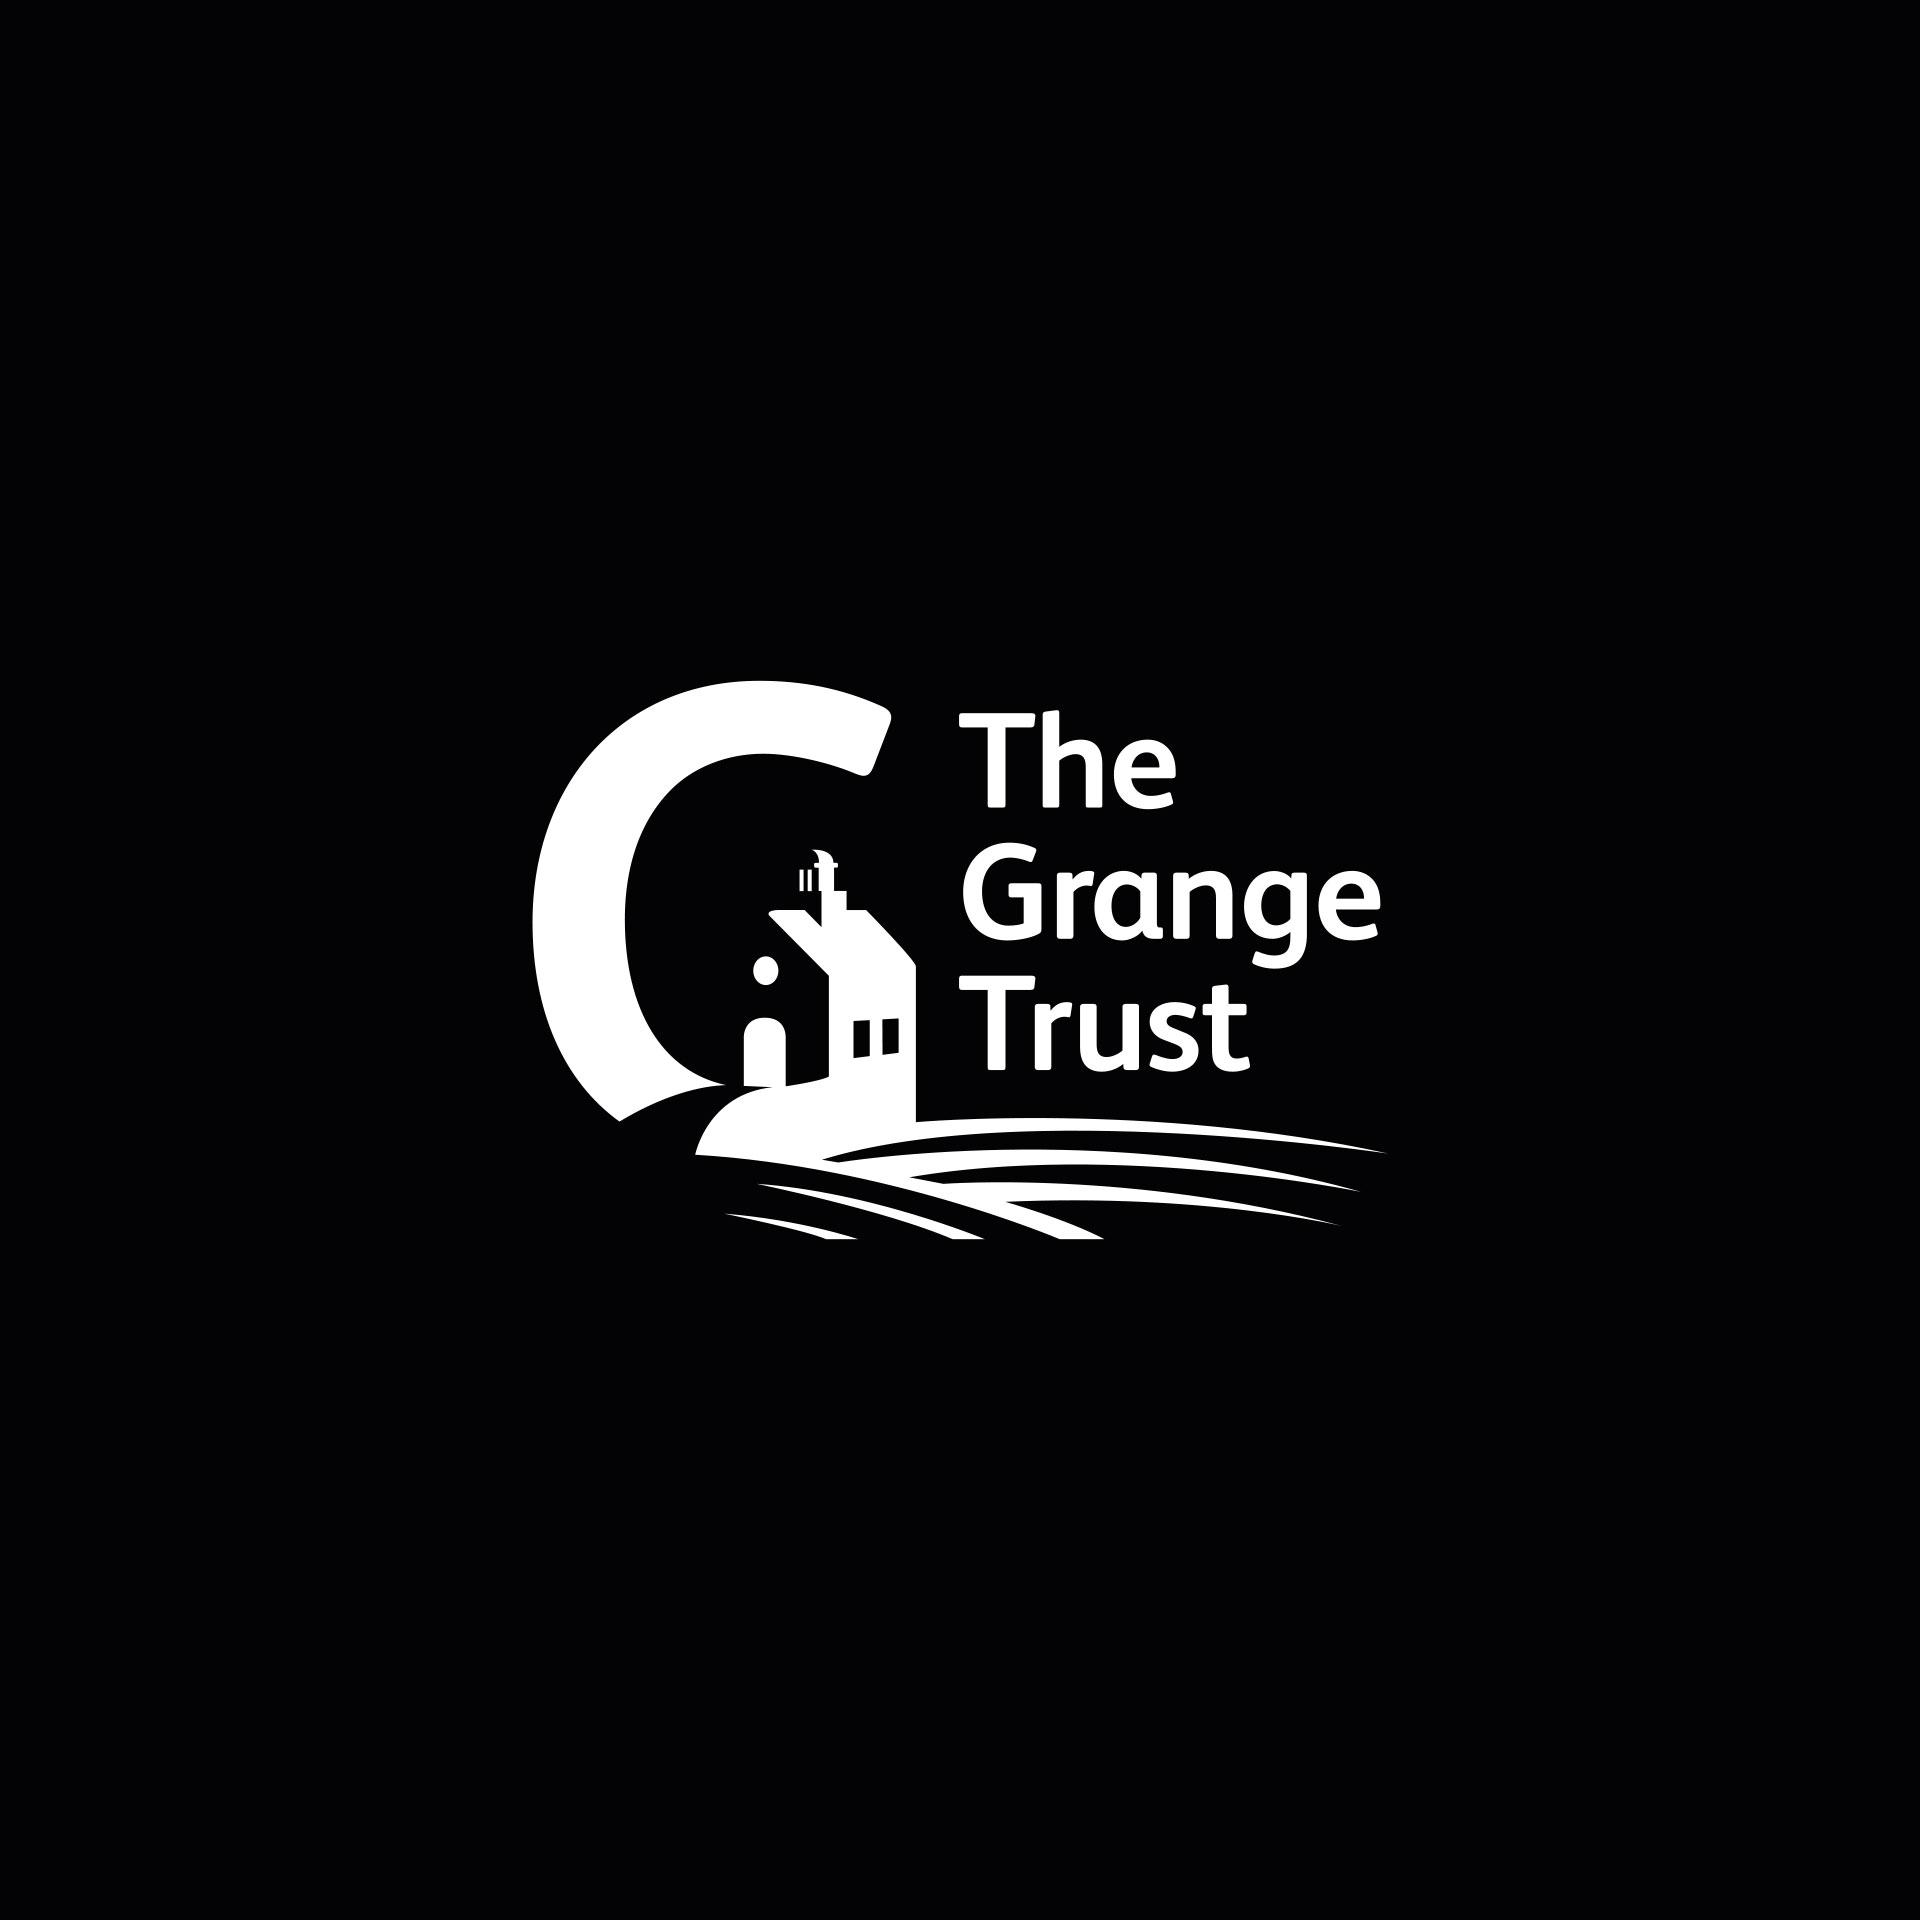 Idea Creative Design Studio Graphic Design Digital Design Website Design Photography Video Production South Yorkshire Rotherham Sheffield Manchester The Grange Trust Logo 4